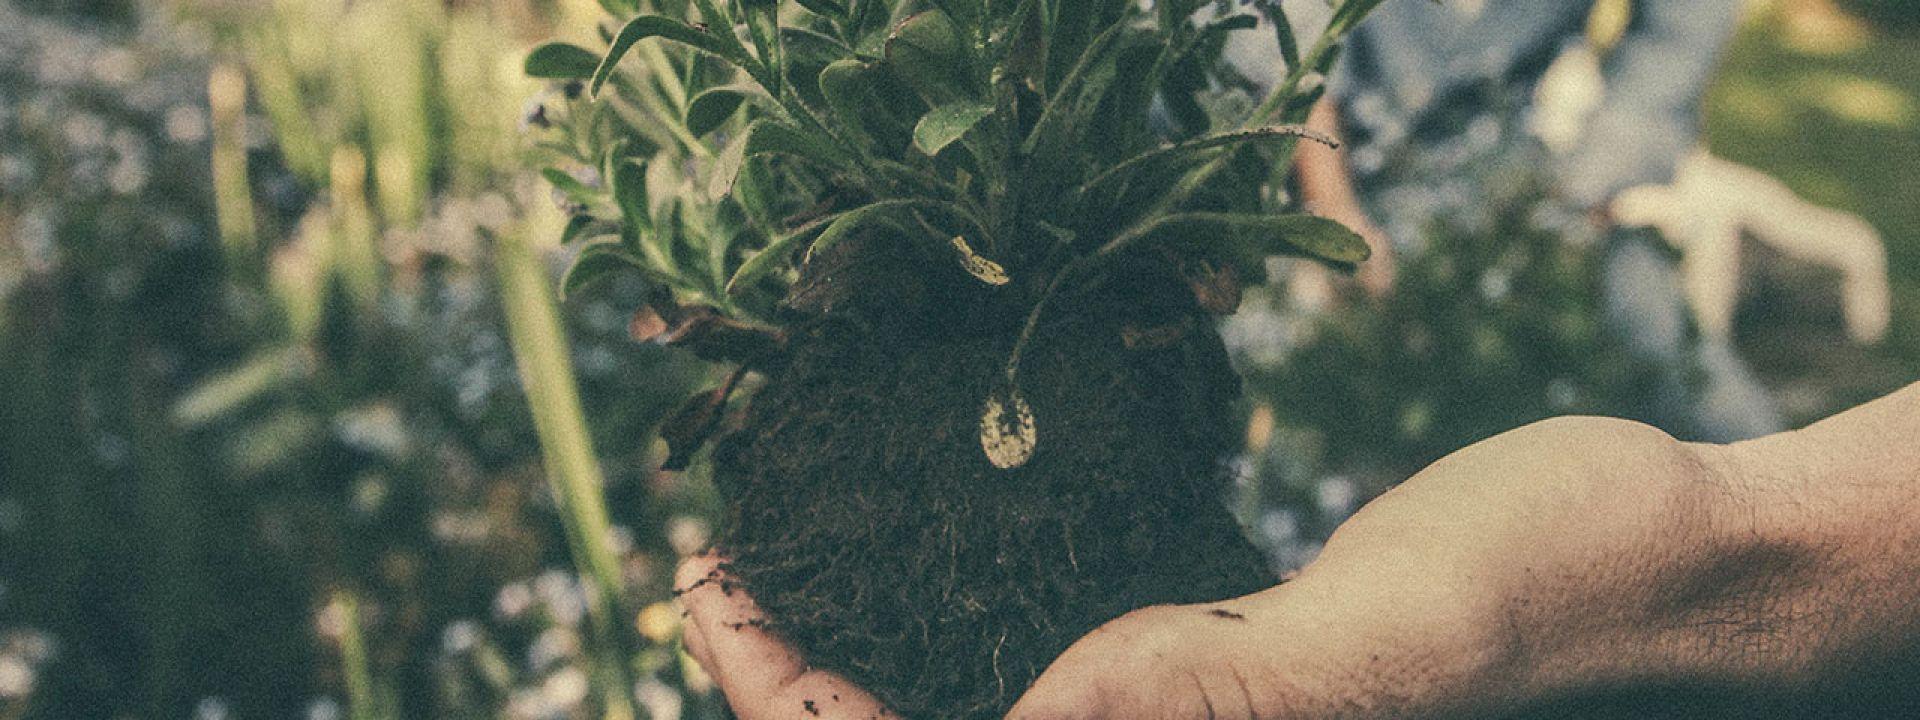 Members Events: Οι Κήποι και τα Μυστικά τους - Ο Αστικός Κήπος - Εικόνα